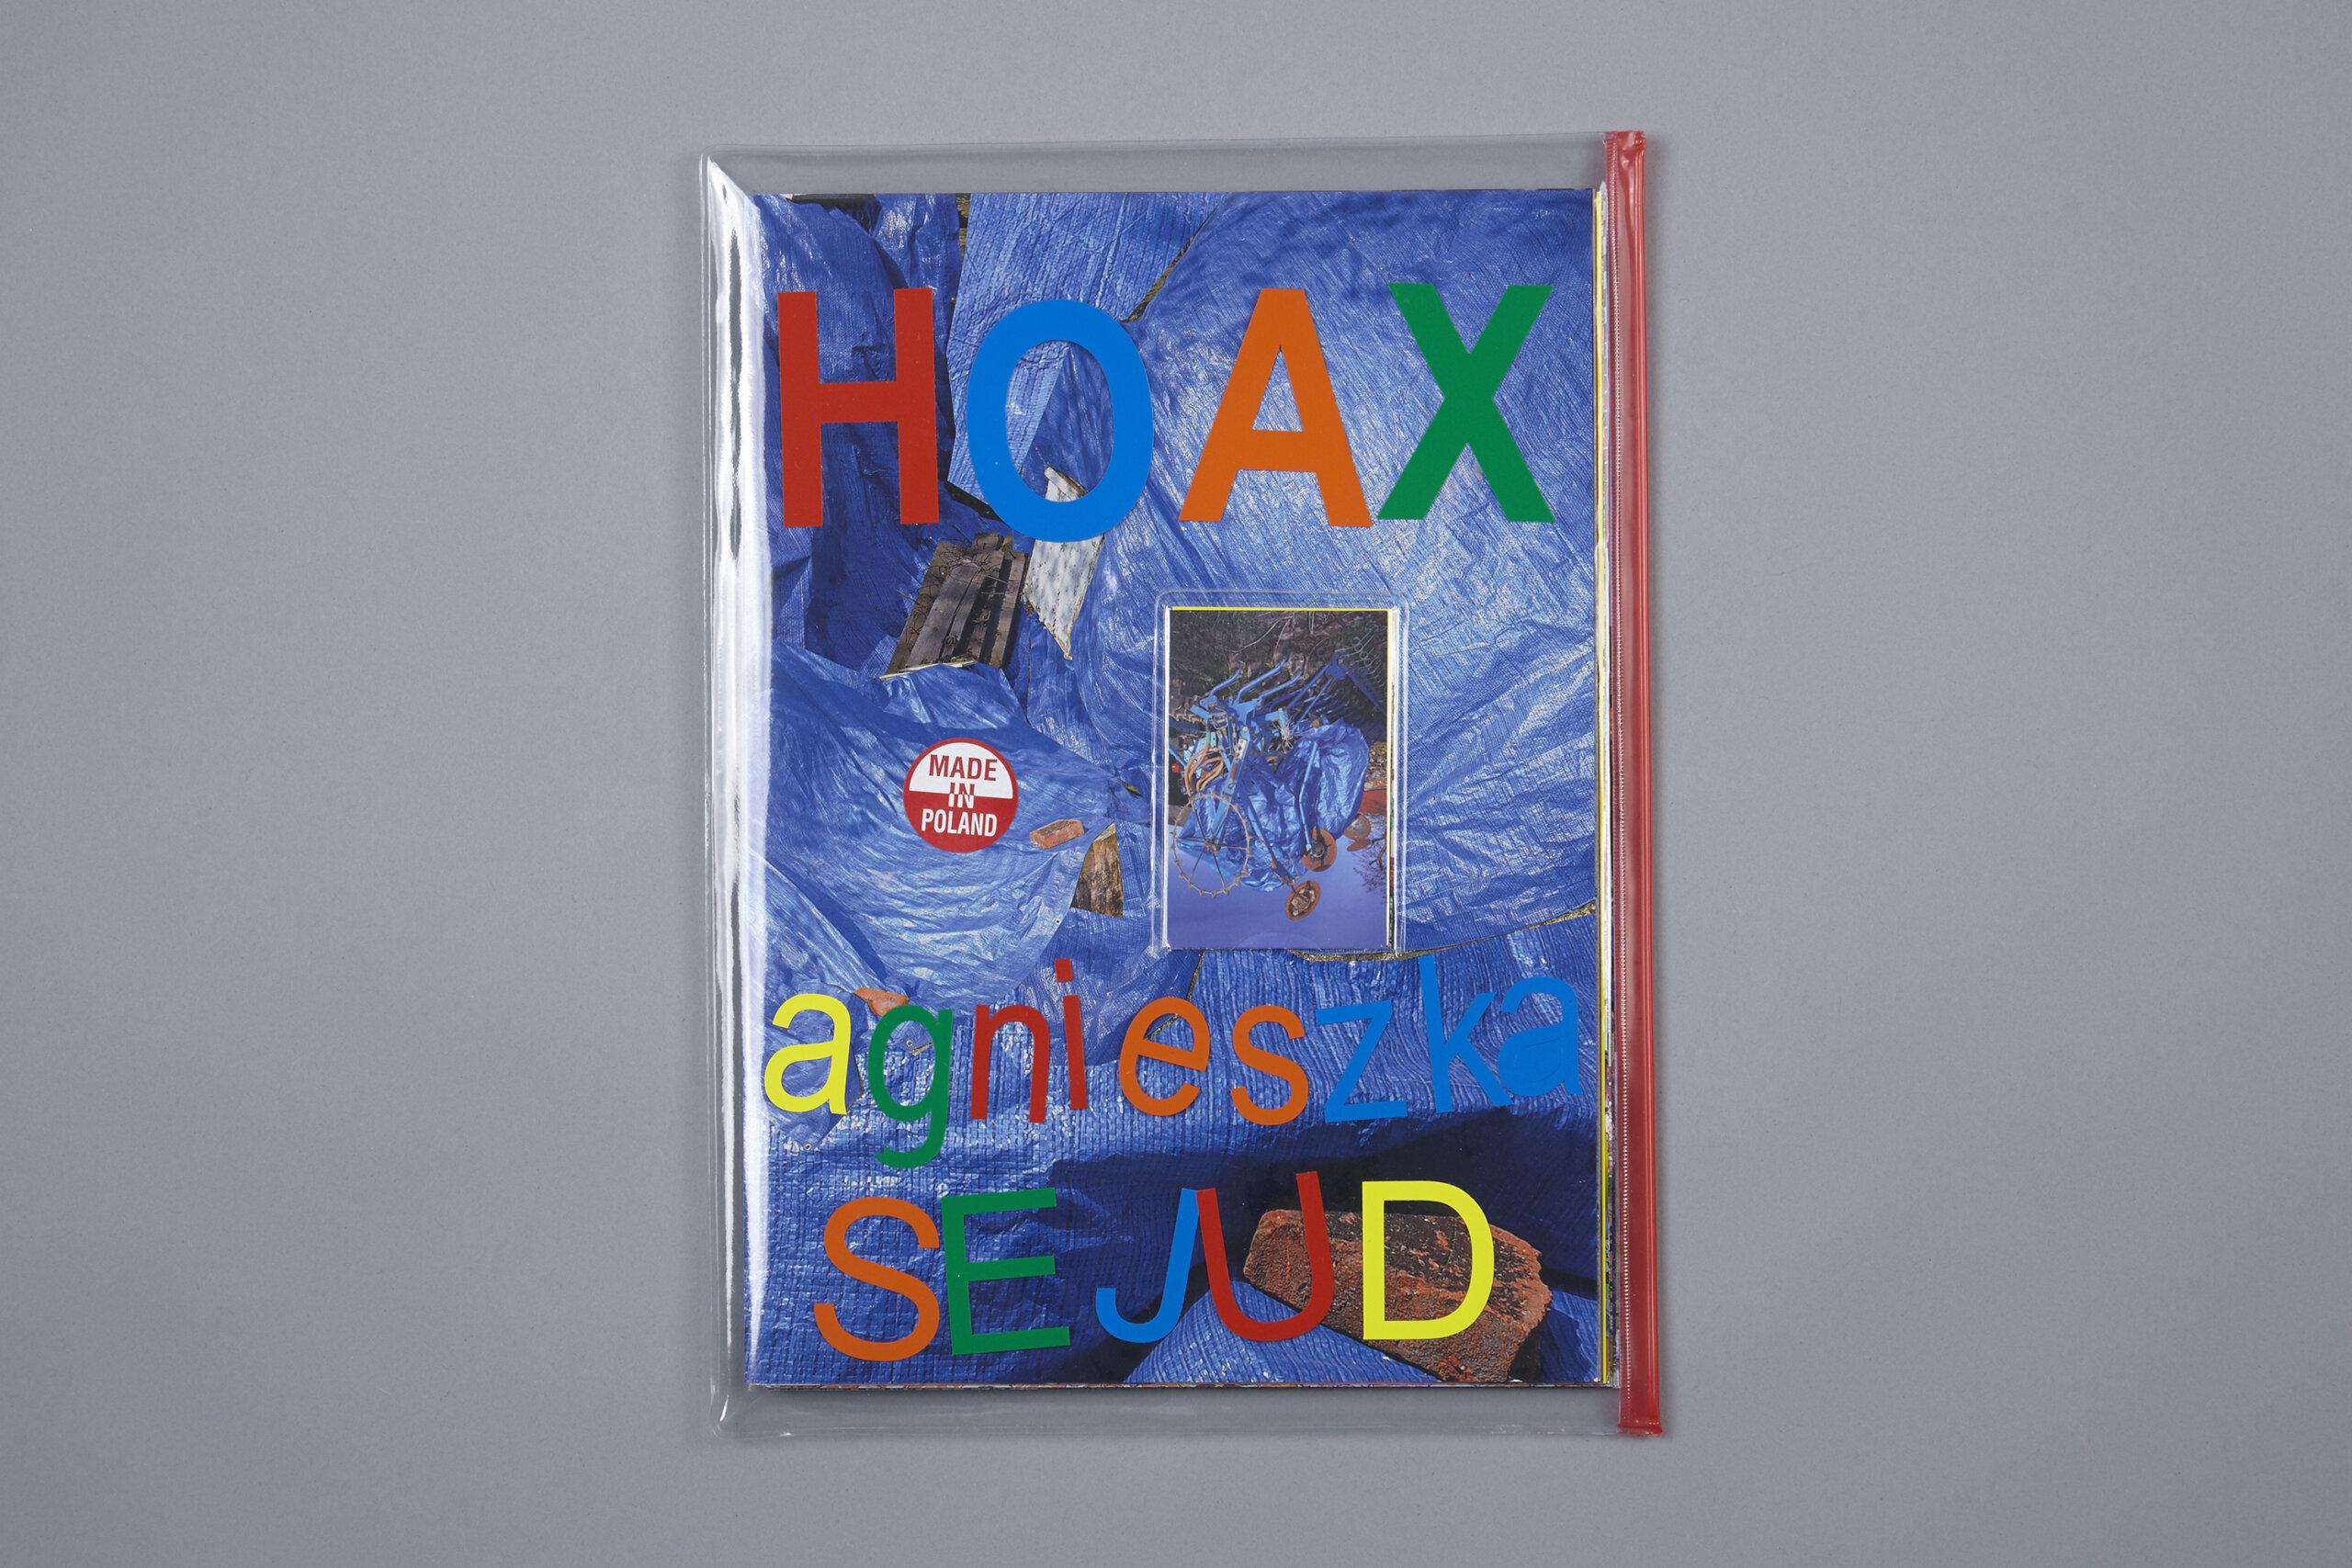 sejud-hoax-delpire-co-1